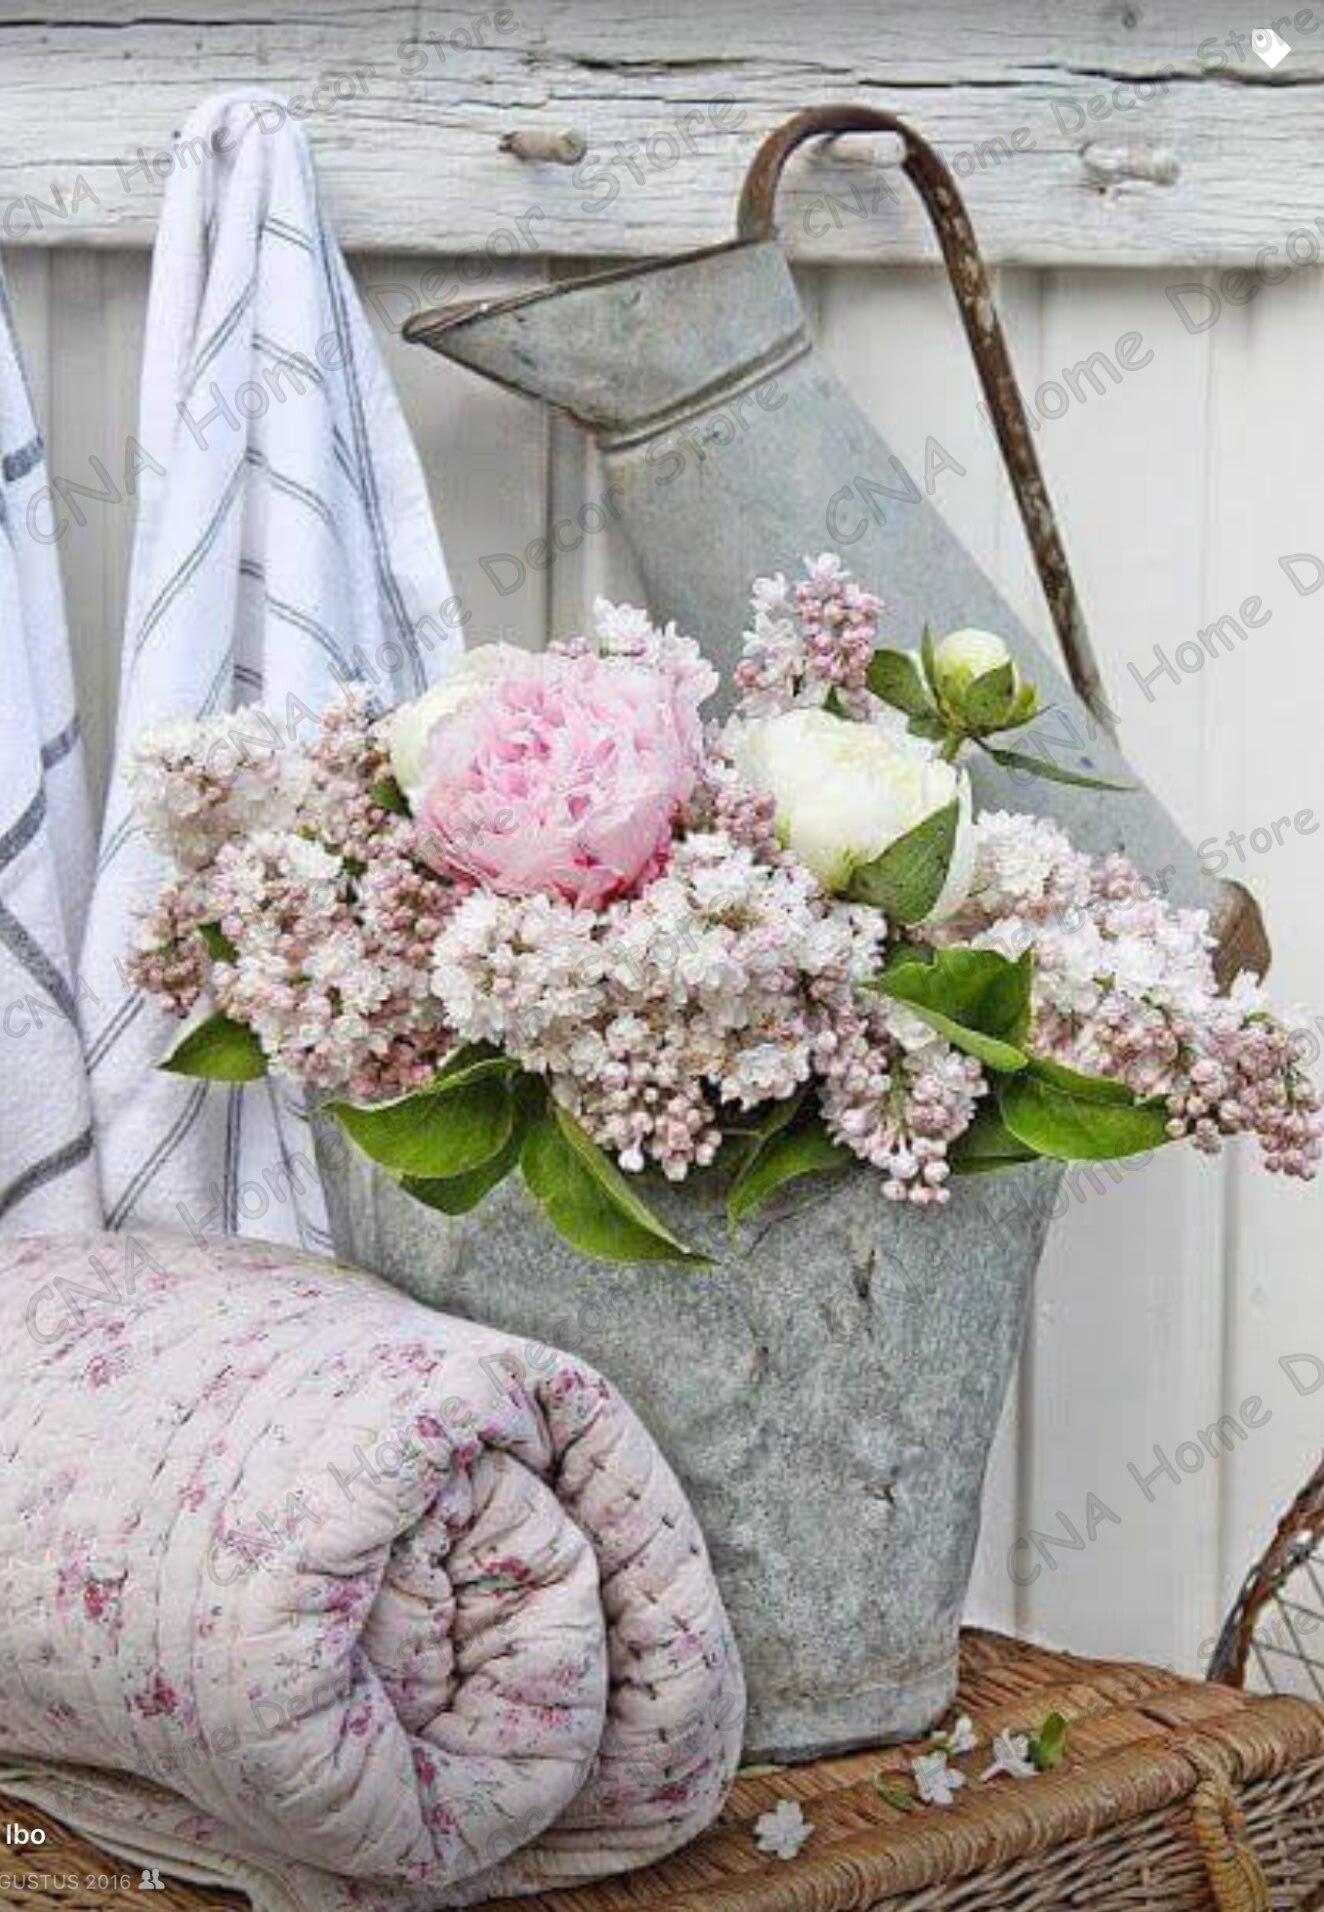 Floral full drill Mosaic 5D Diy Embroidery Diamond Painting Resin 3D Cross Stitch Kits handmade craft Sticker Wedding room decor